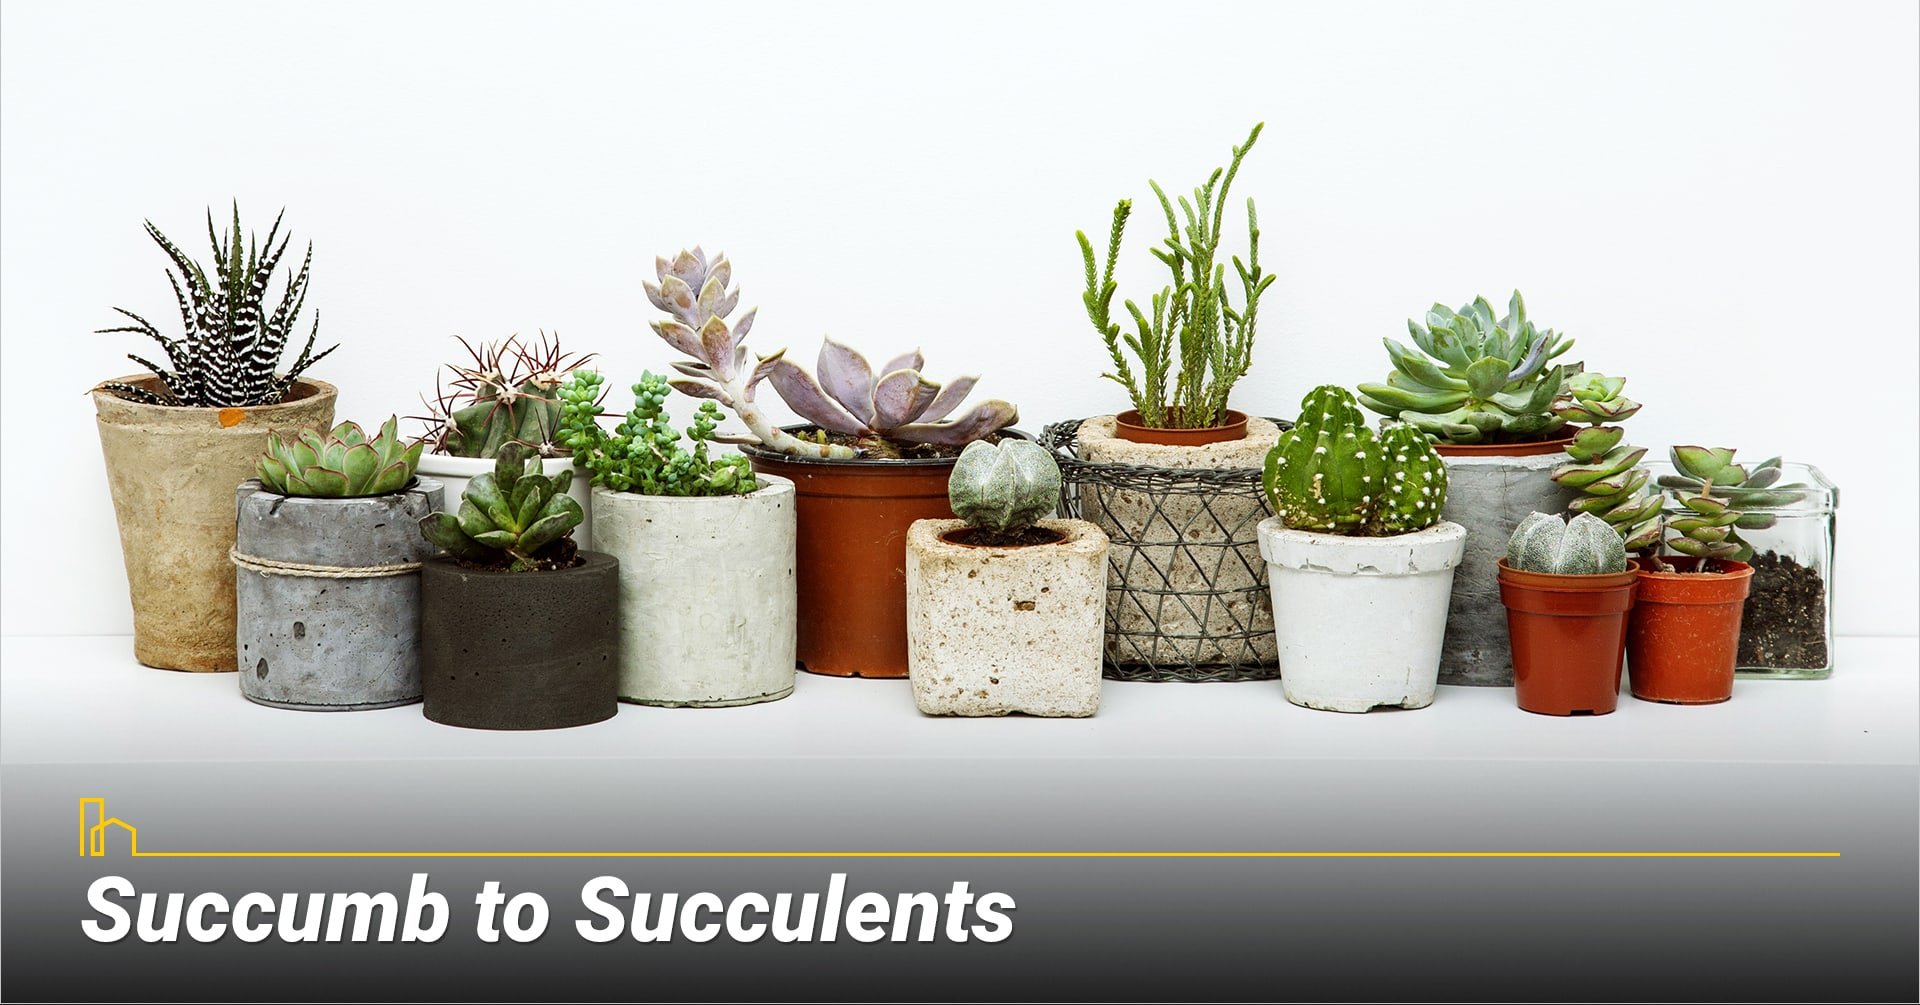 Succumb to Succulents, consider low maintenance plants